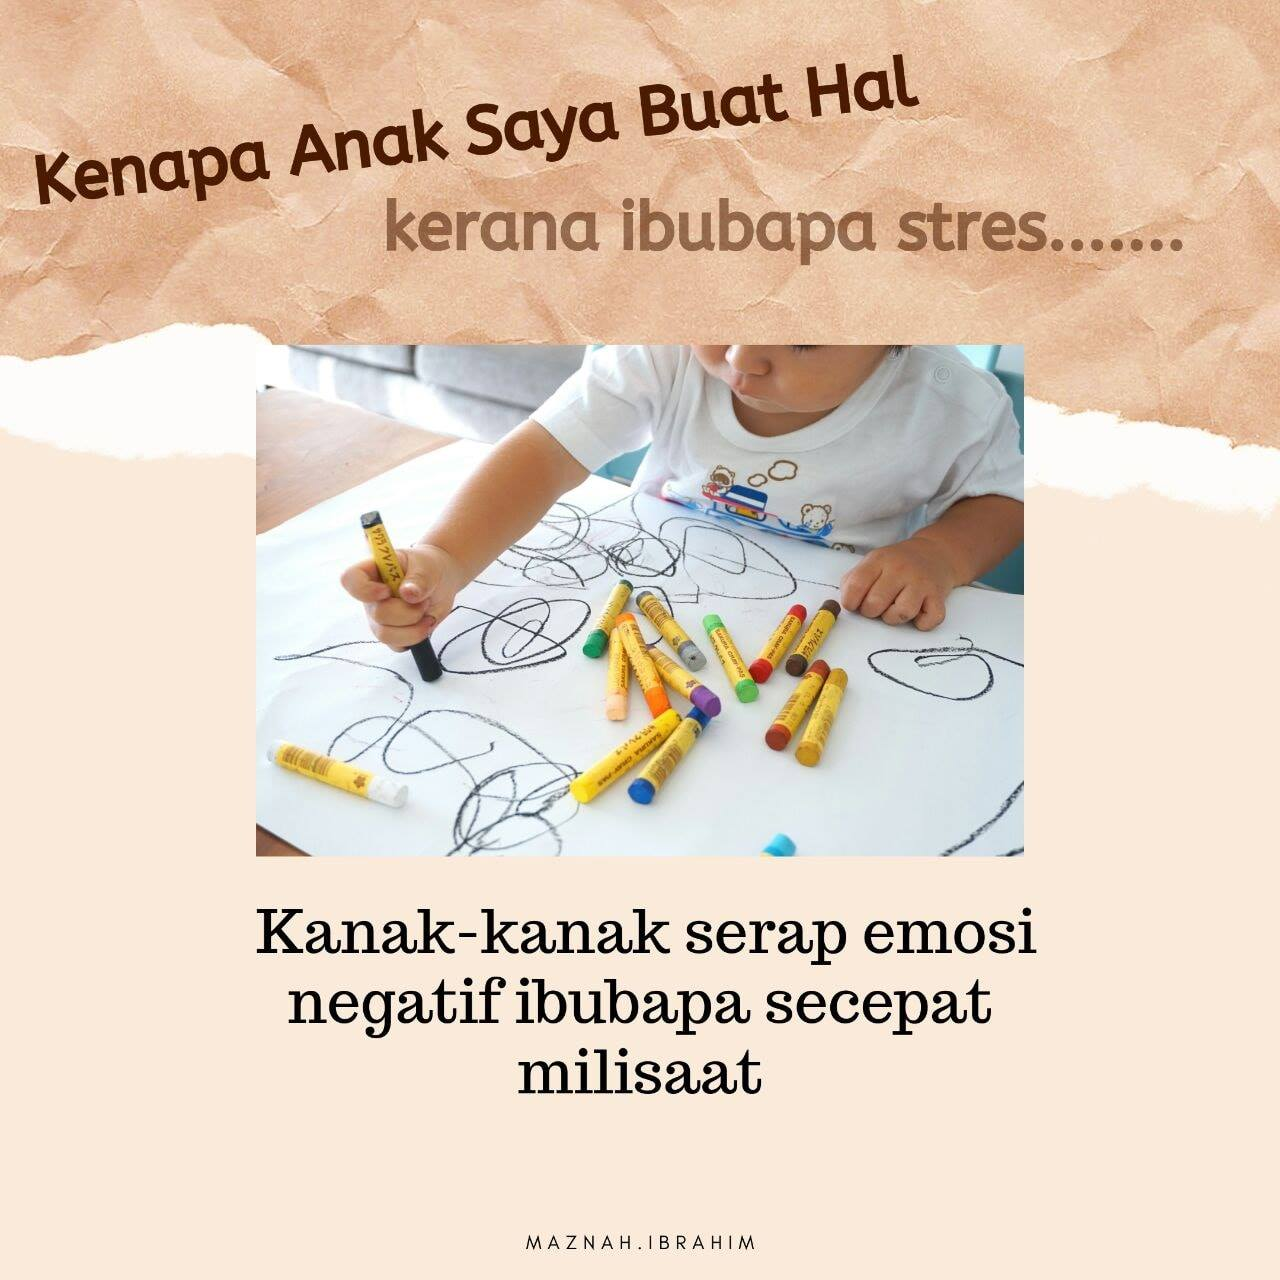 You are currently viewing Tips Keibubapan #41.2 (Kenapa Anak Buat Hal dan Cara Bantu Dia)